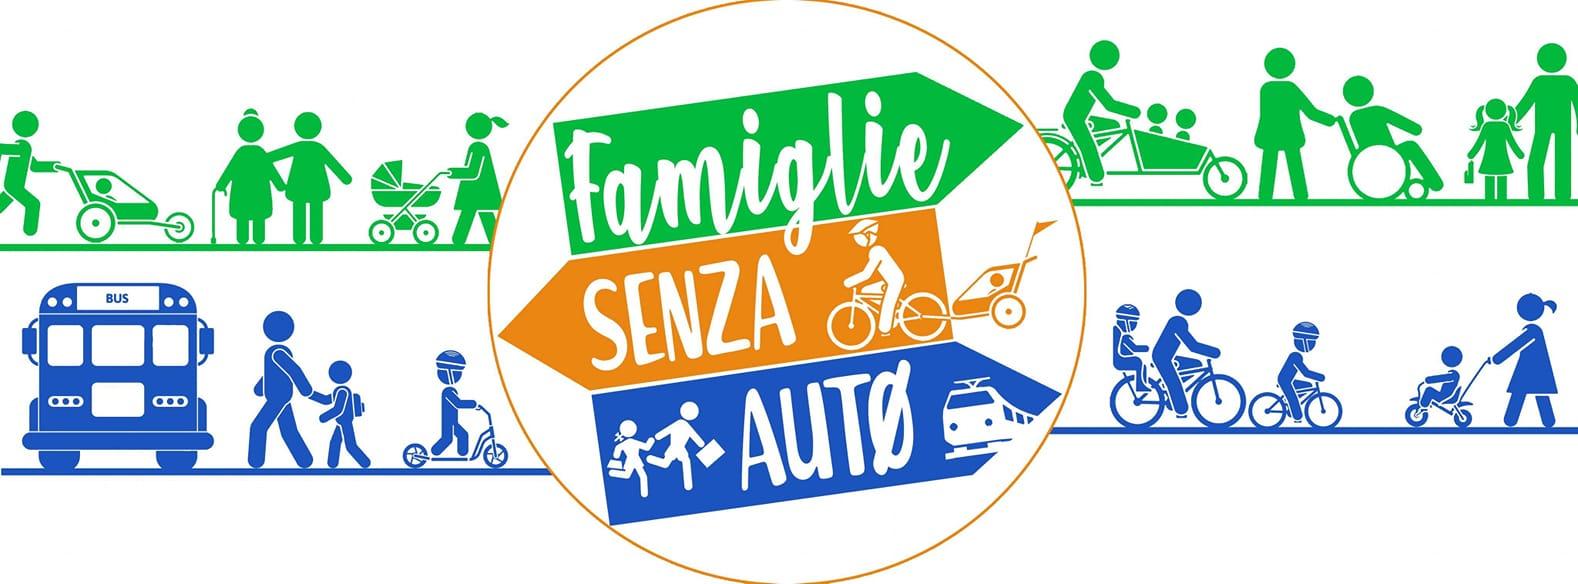 Famiglie senza auto sono un gruppo su Facebook